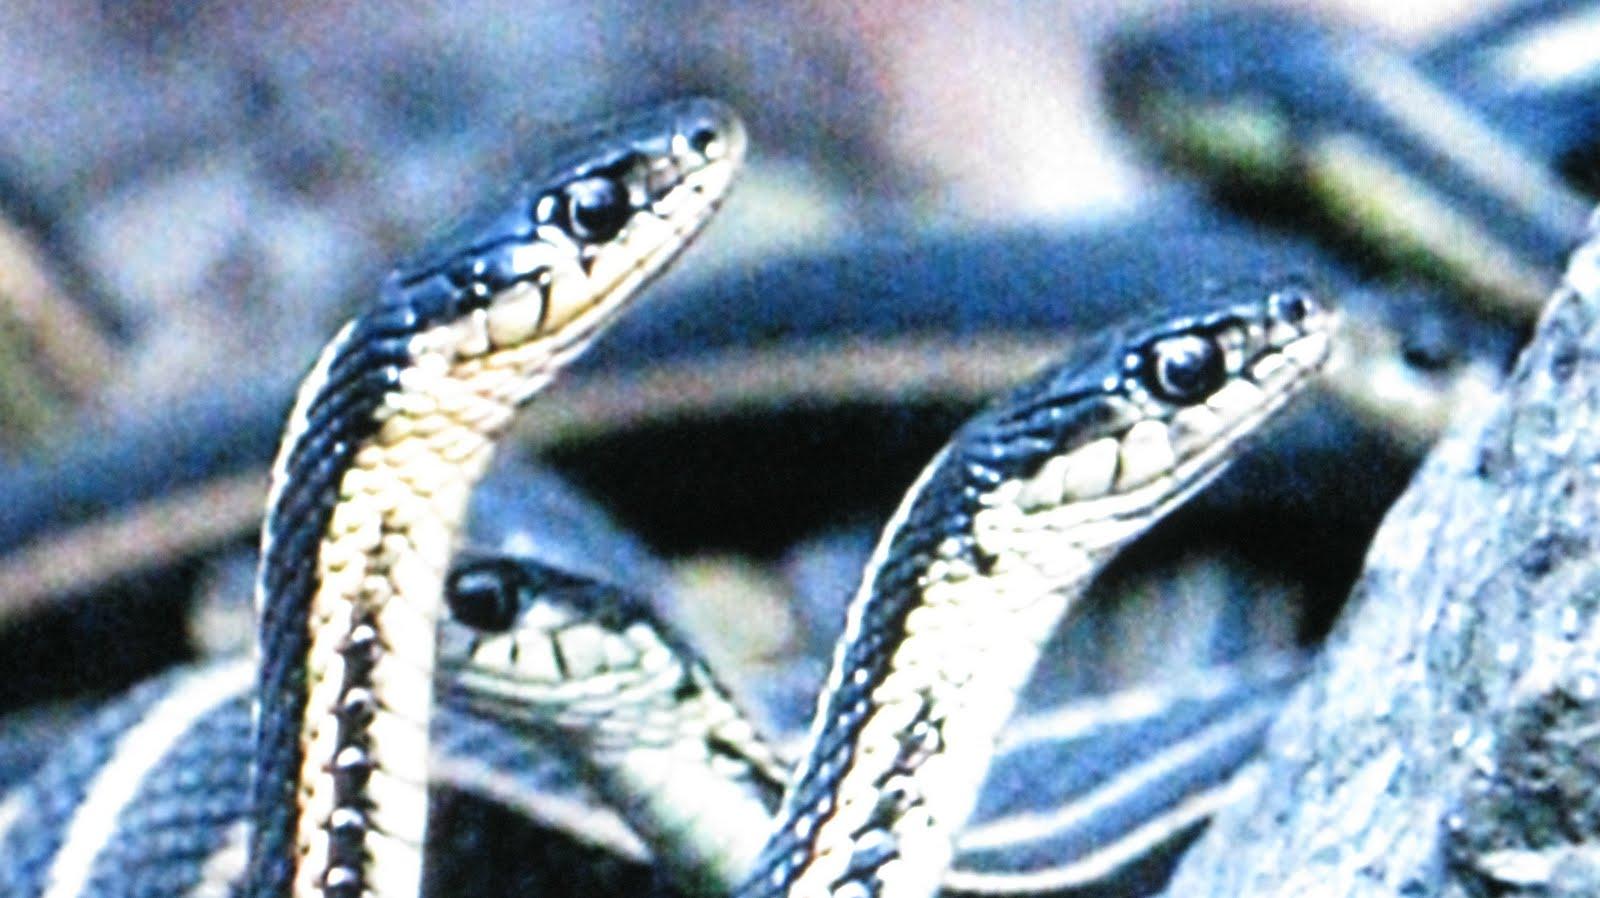 http://1.bp.blogspot.com/_Eco7TB0Jqvc/TFpw1g1Kv3I/AAAAAAAABj0/pVzpY3BMBqQ/s1600/snake+head+2.jpg